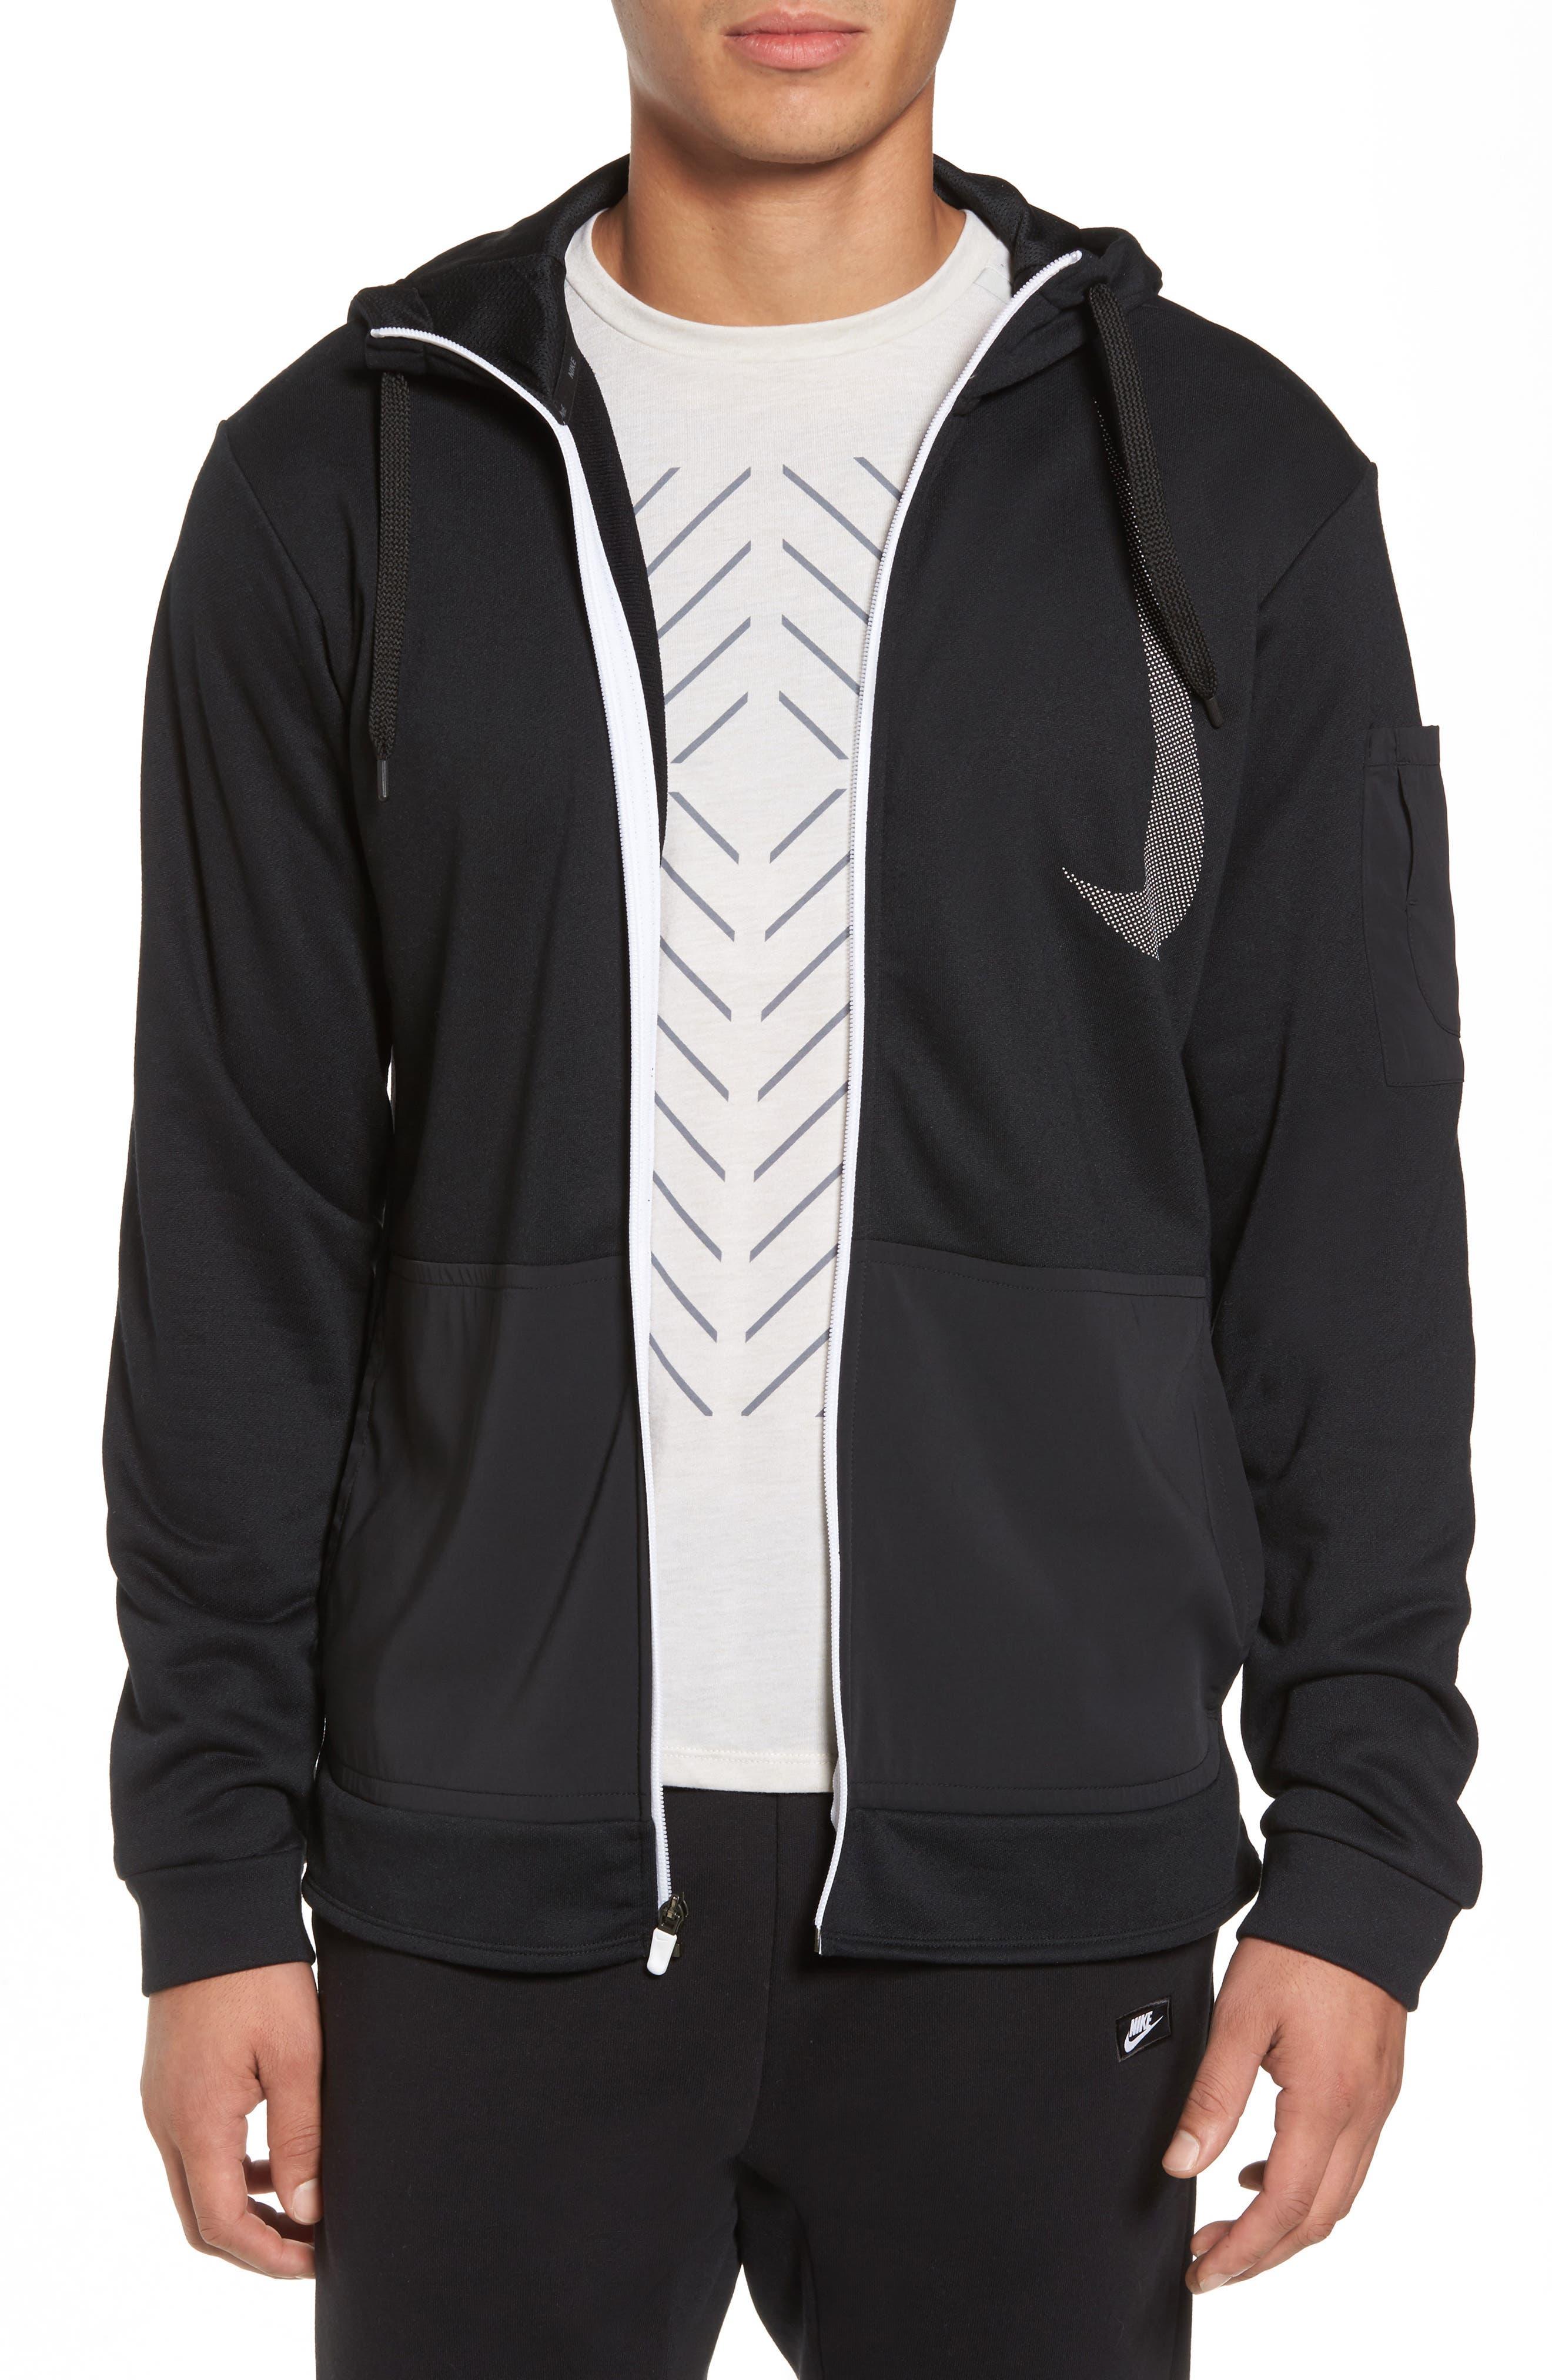 Training Dry PX Zip Hoodie,                         Main,                         color, Black/ Black/ White